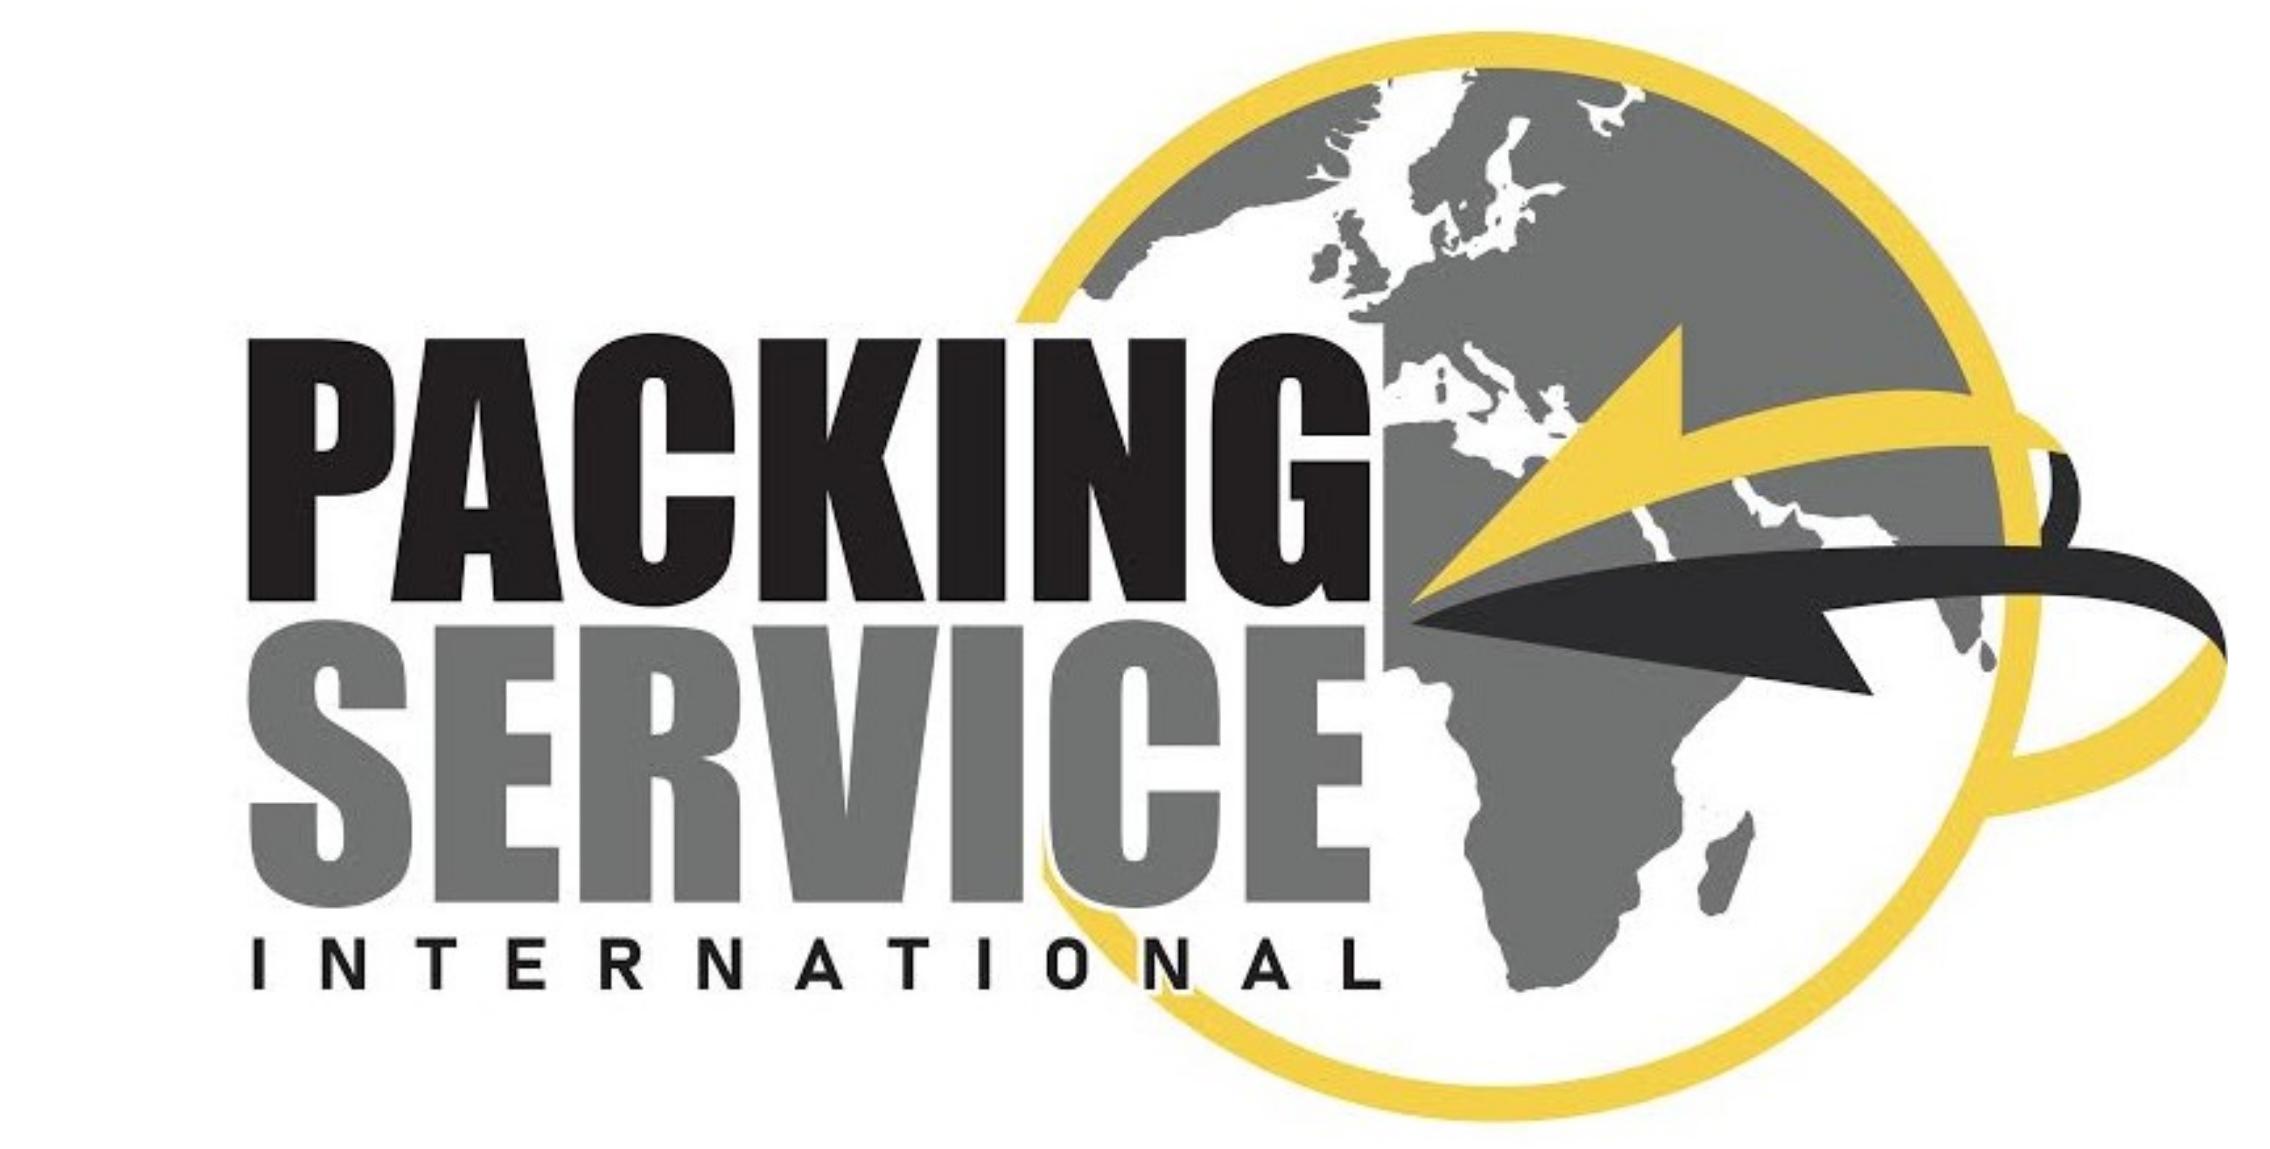 Packing Service International